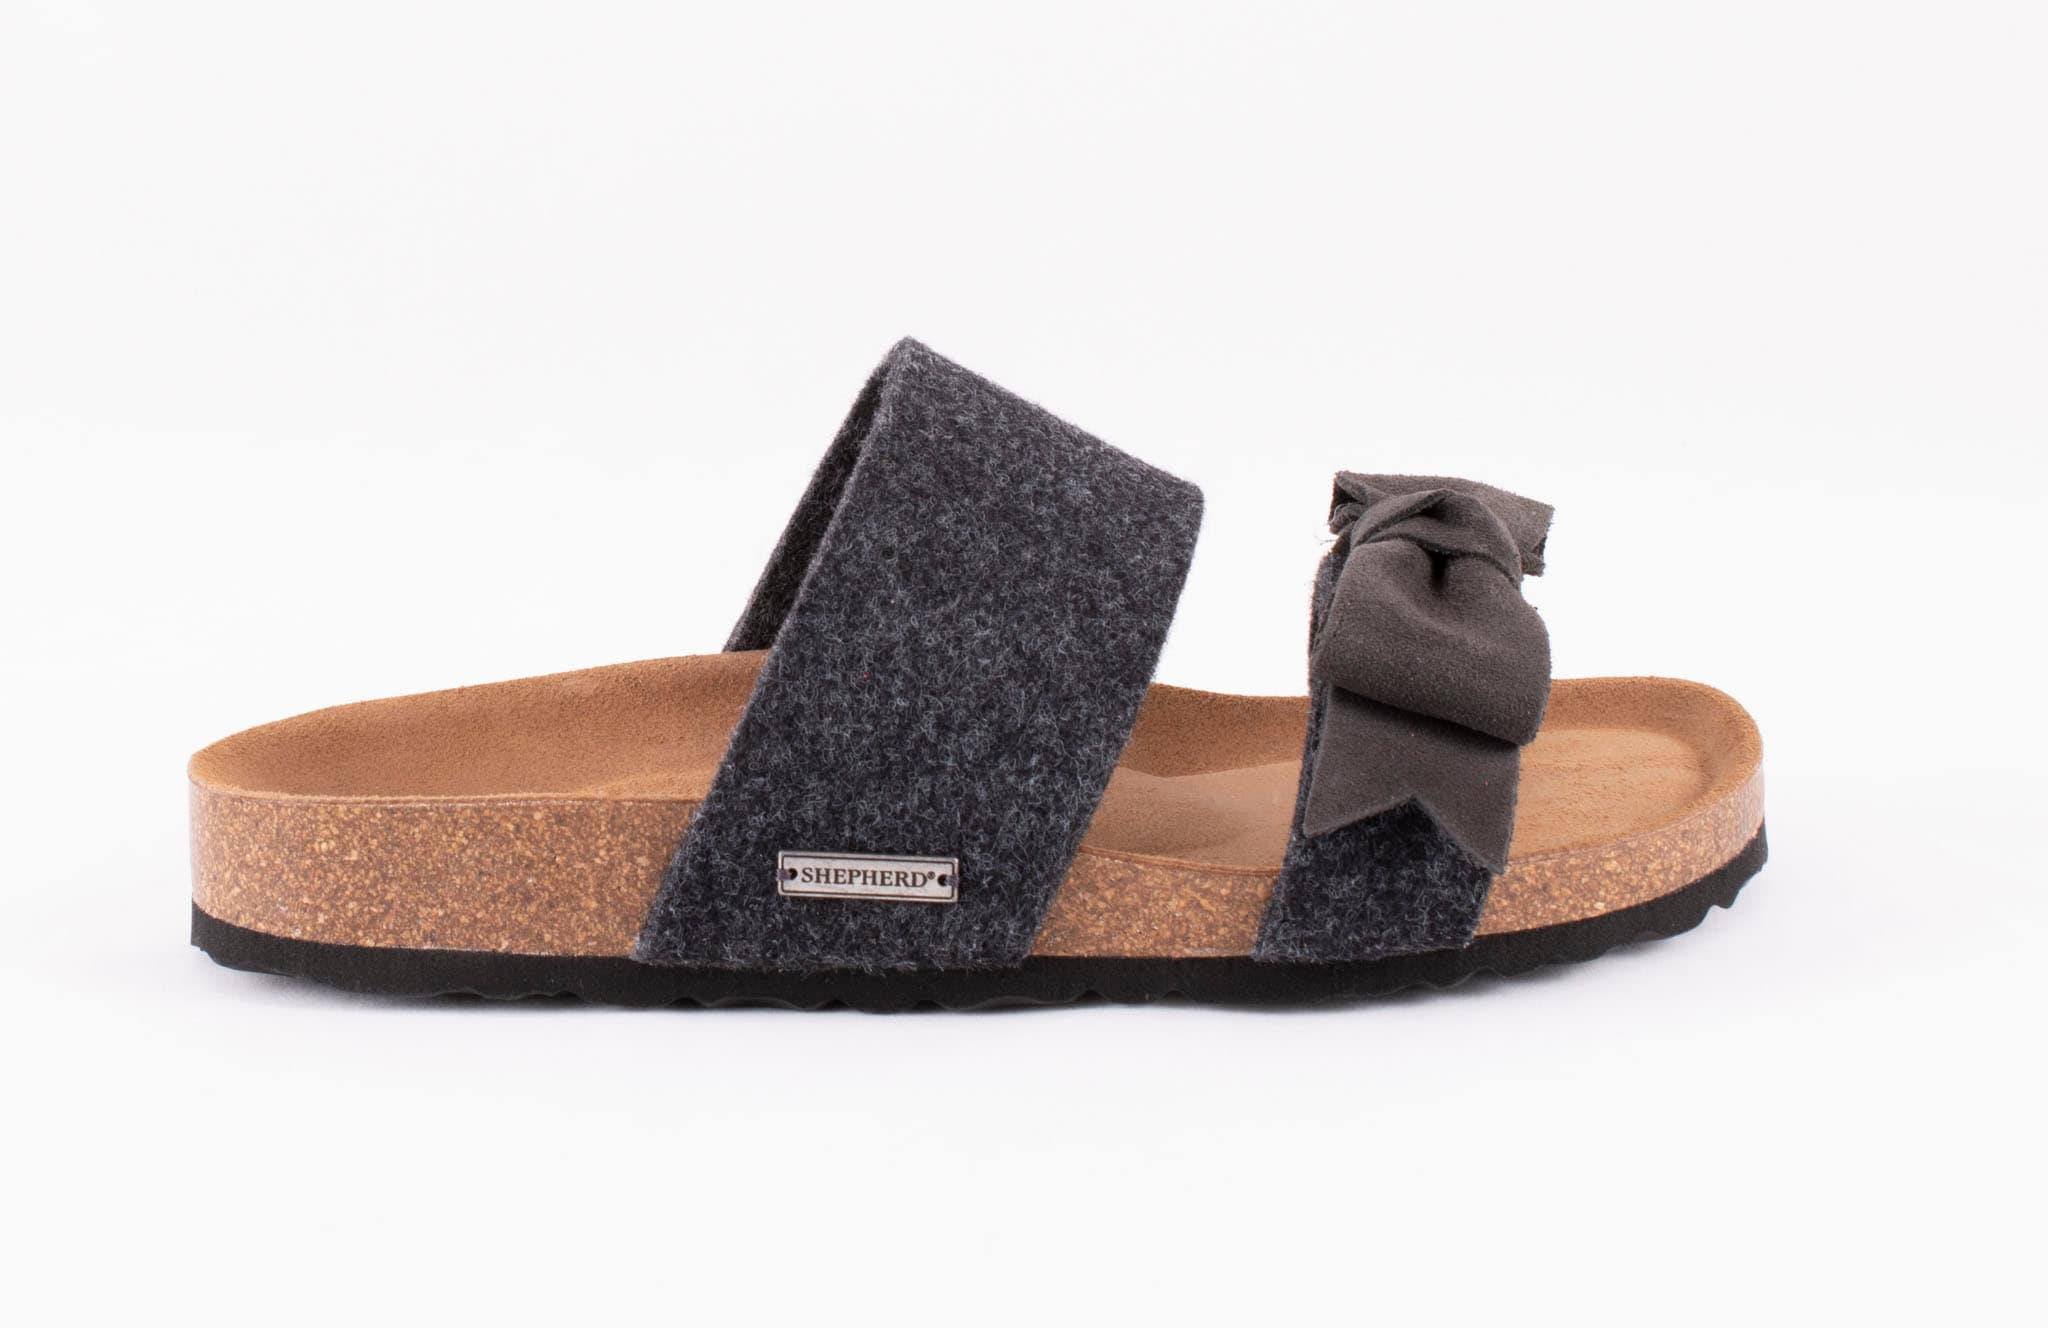 Elisabet ull sandal